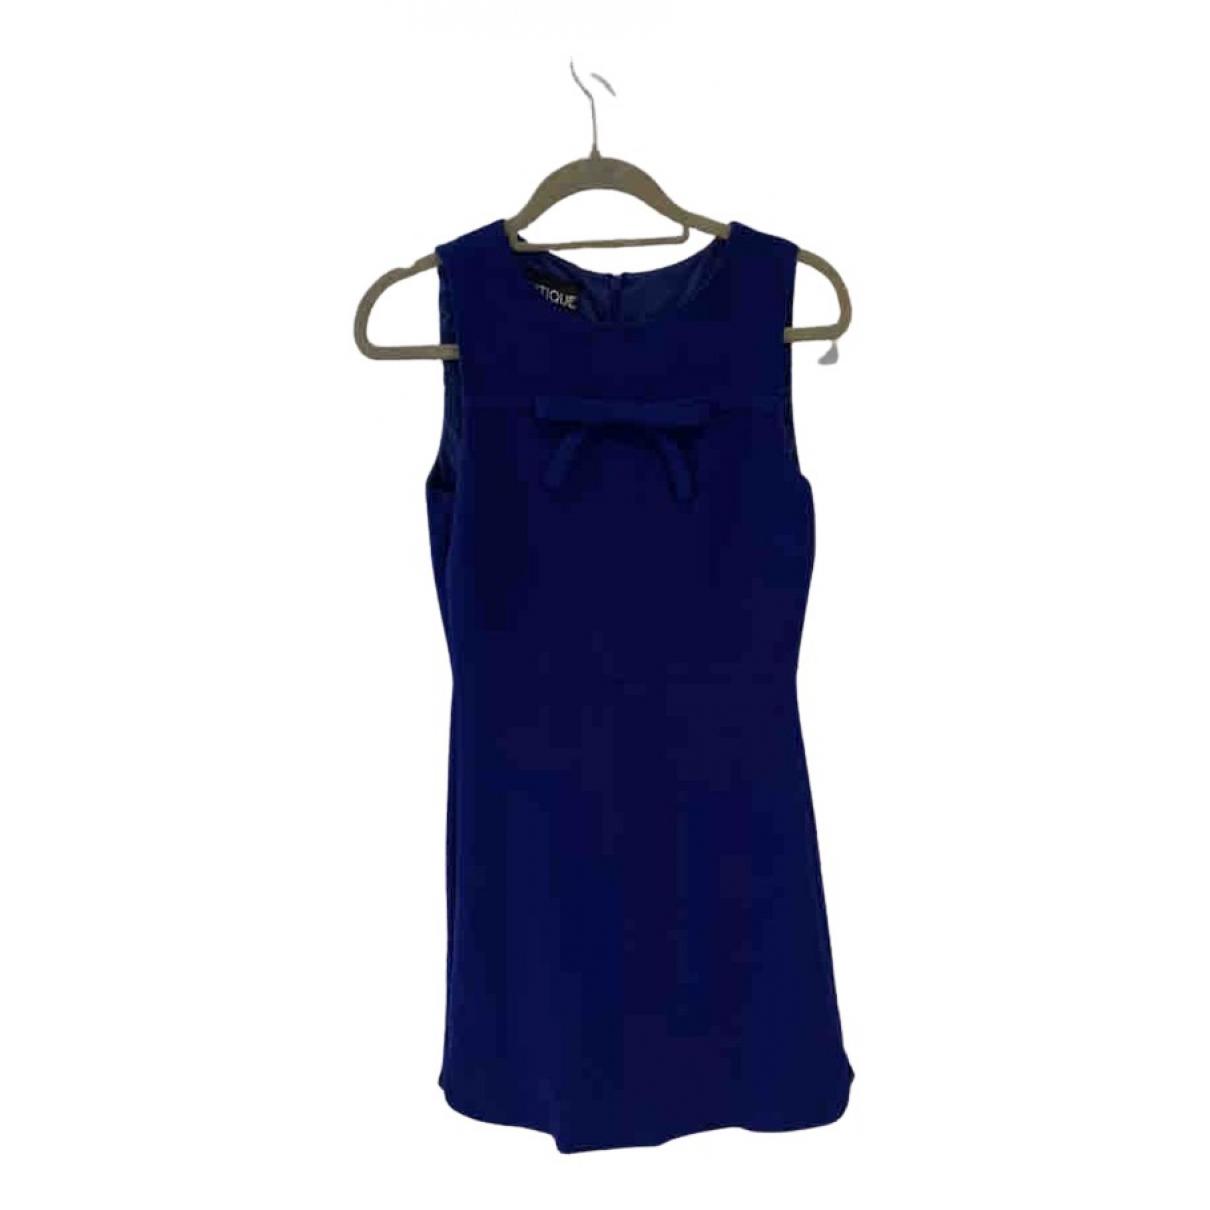 Moschino N Blue Wool dress for Women 8 UK